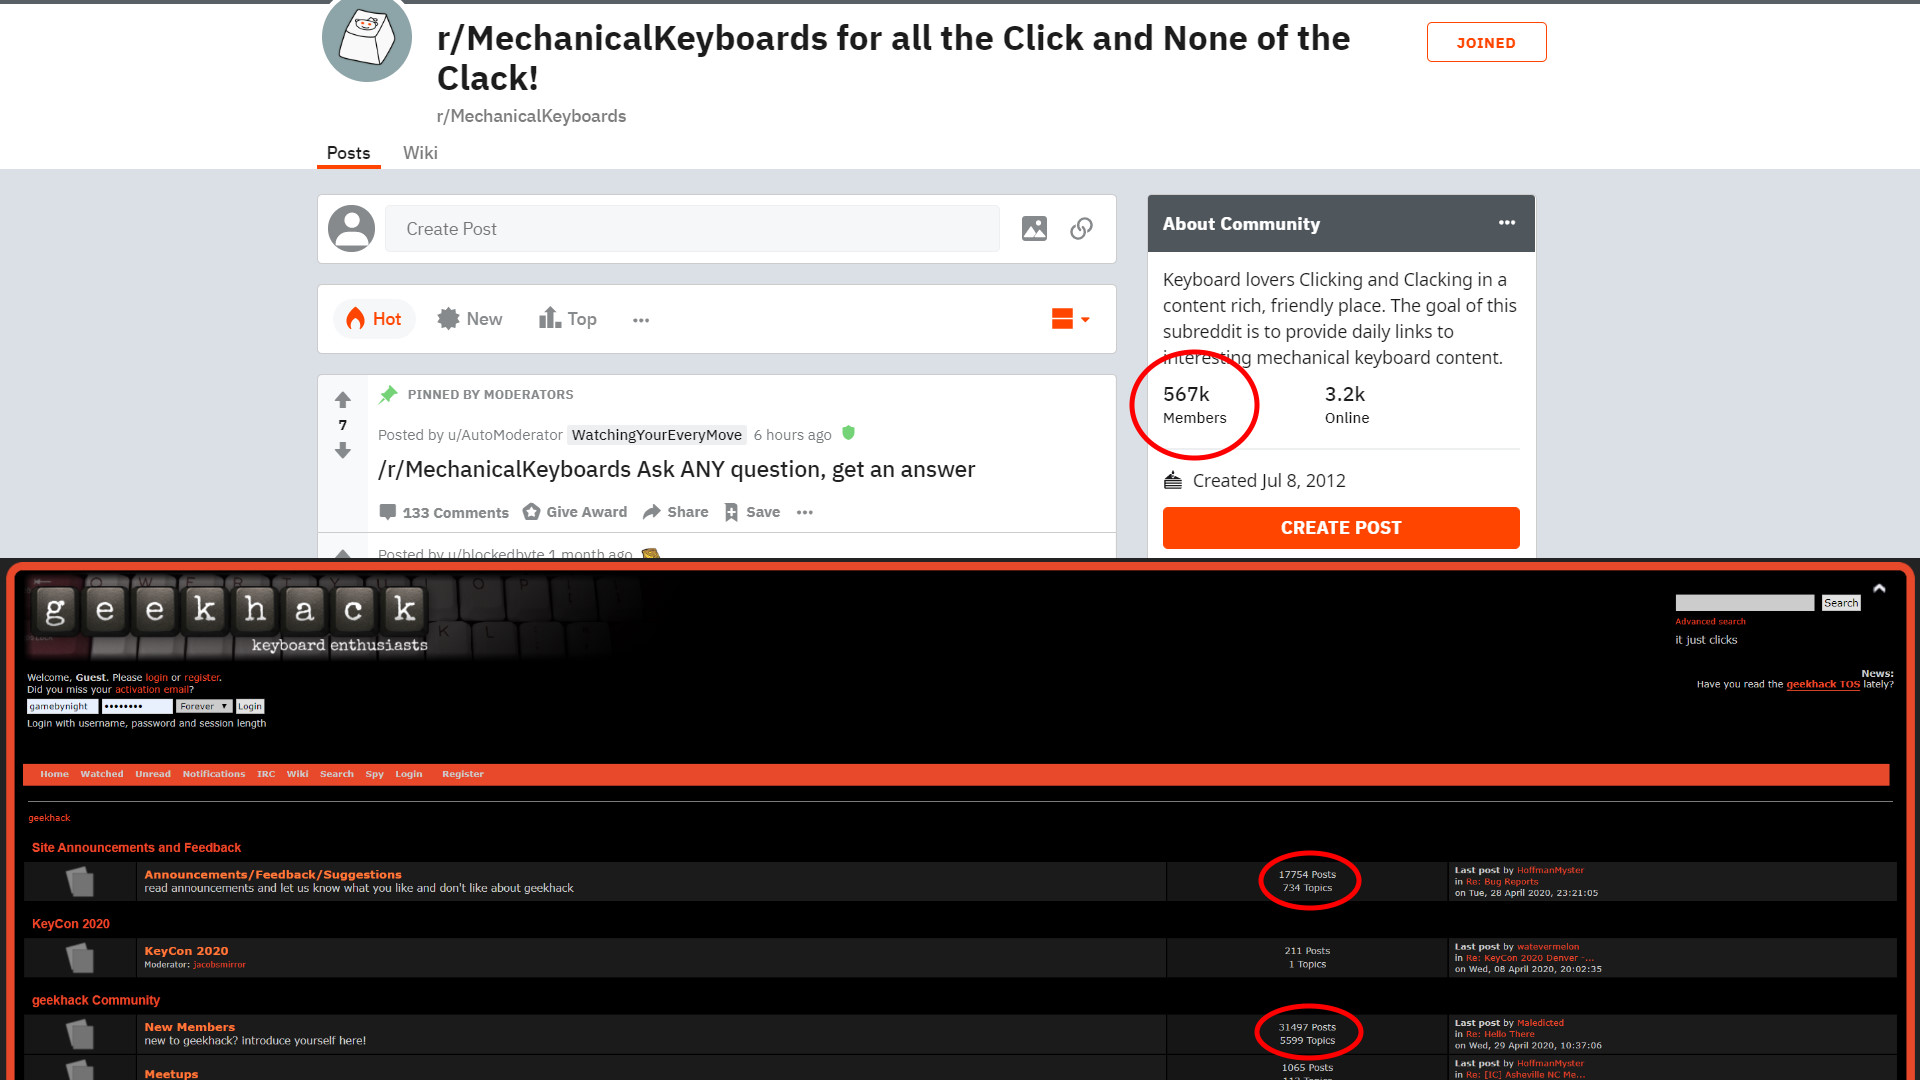 Major Keyboard Communities